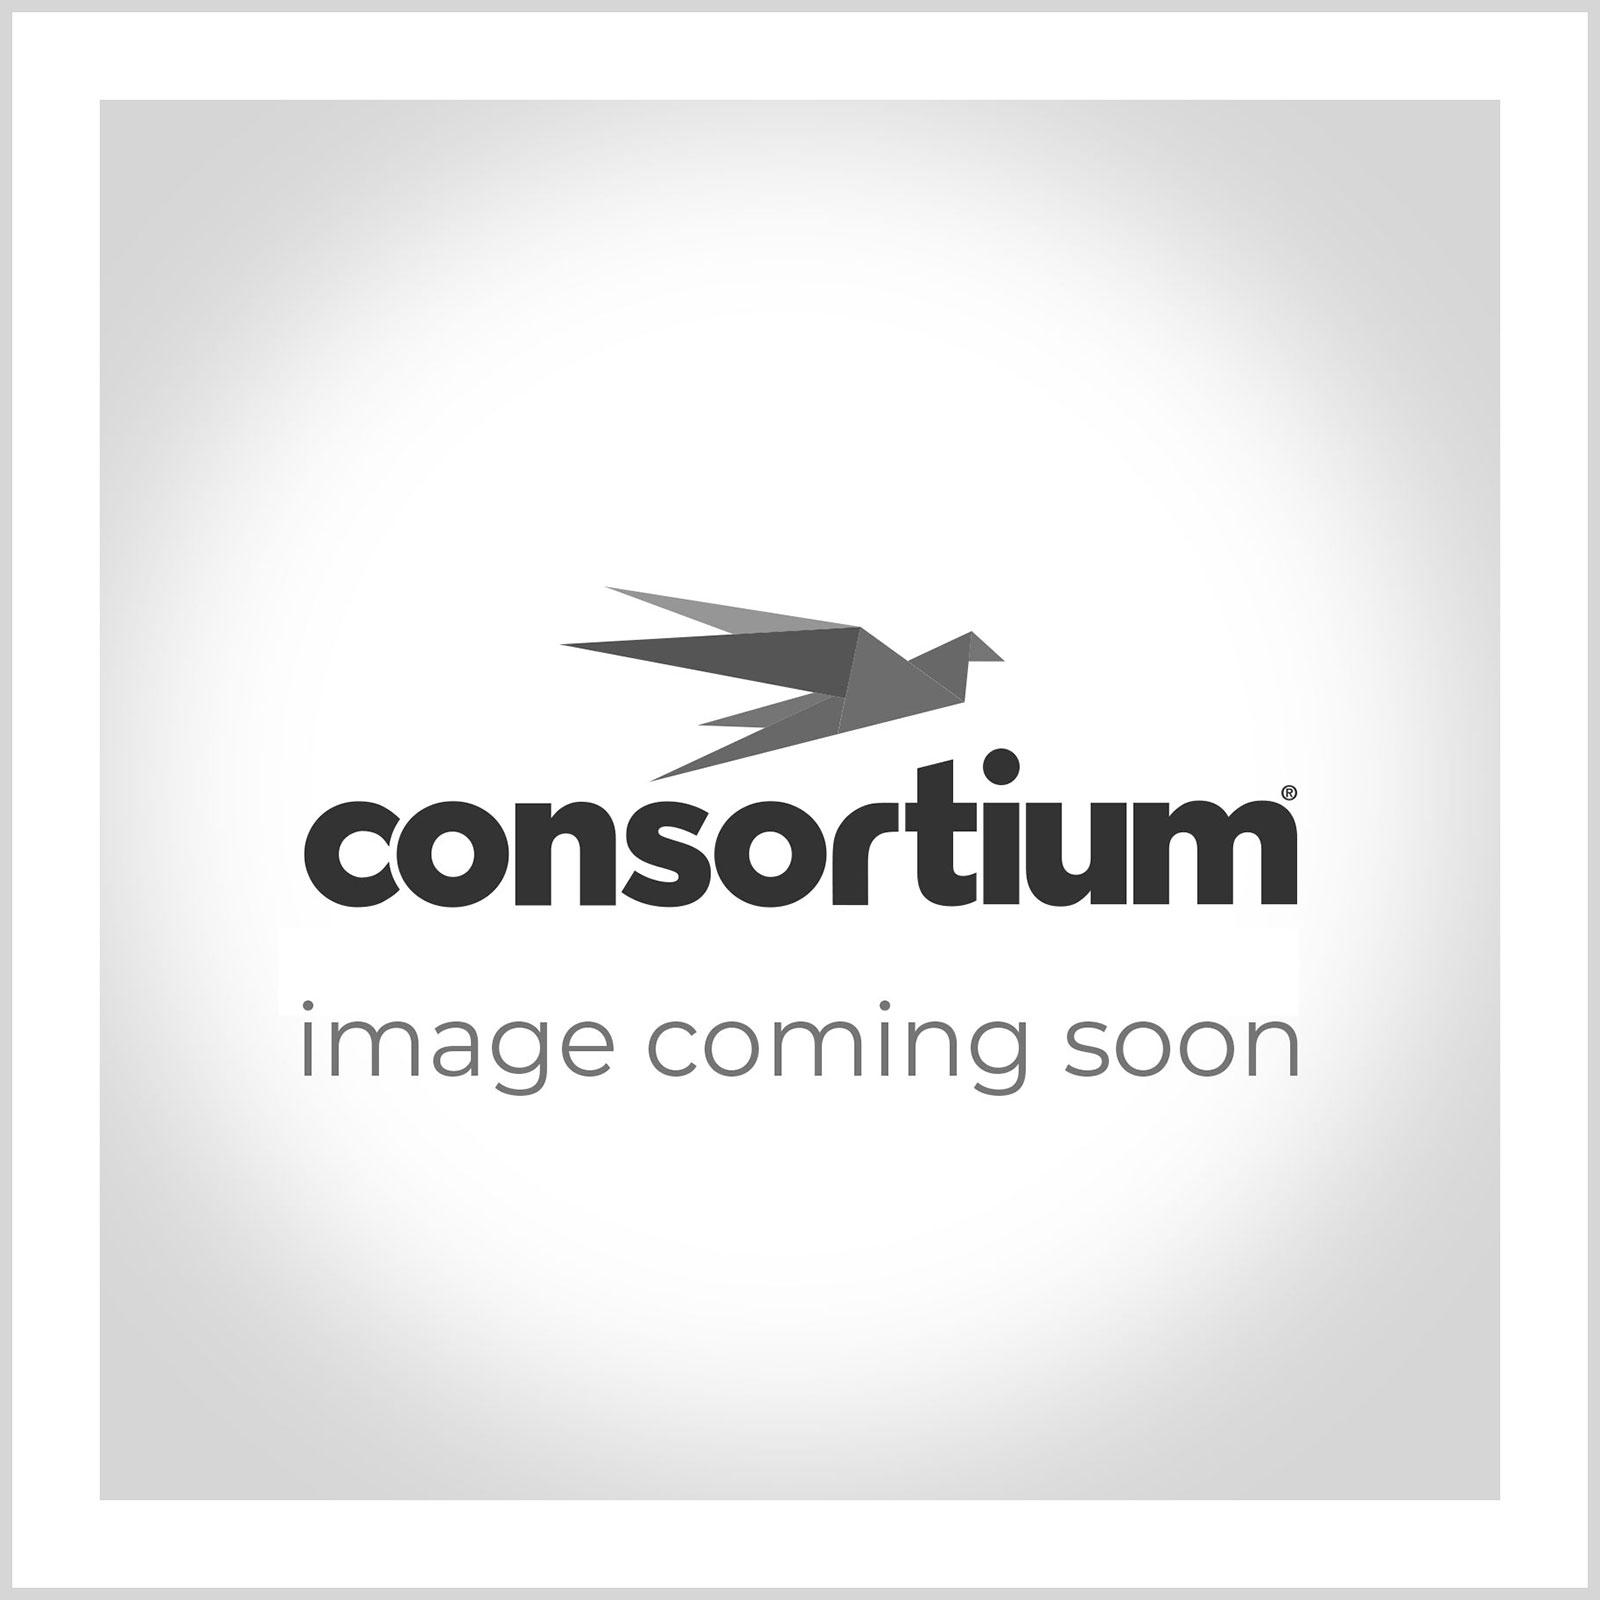 Parachute Canopies